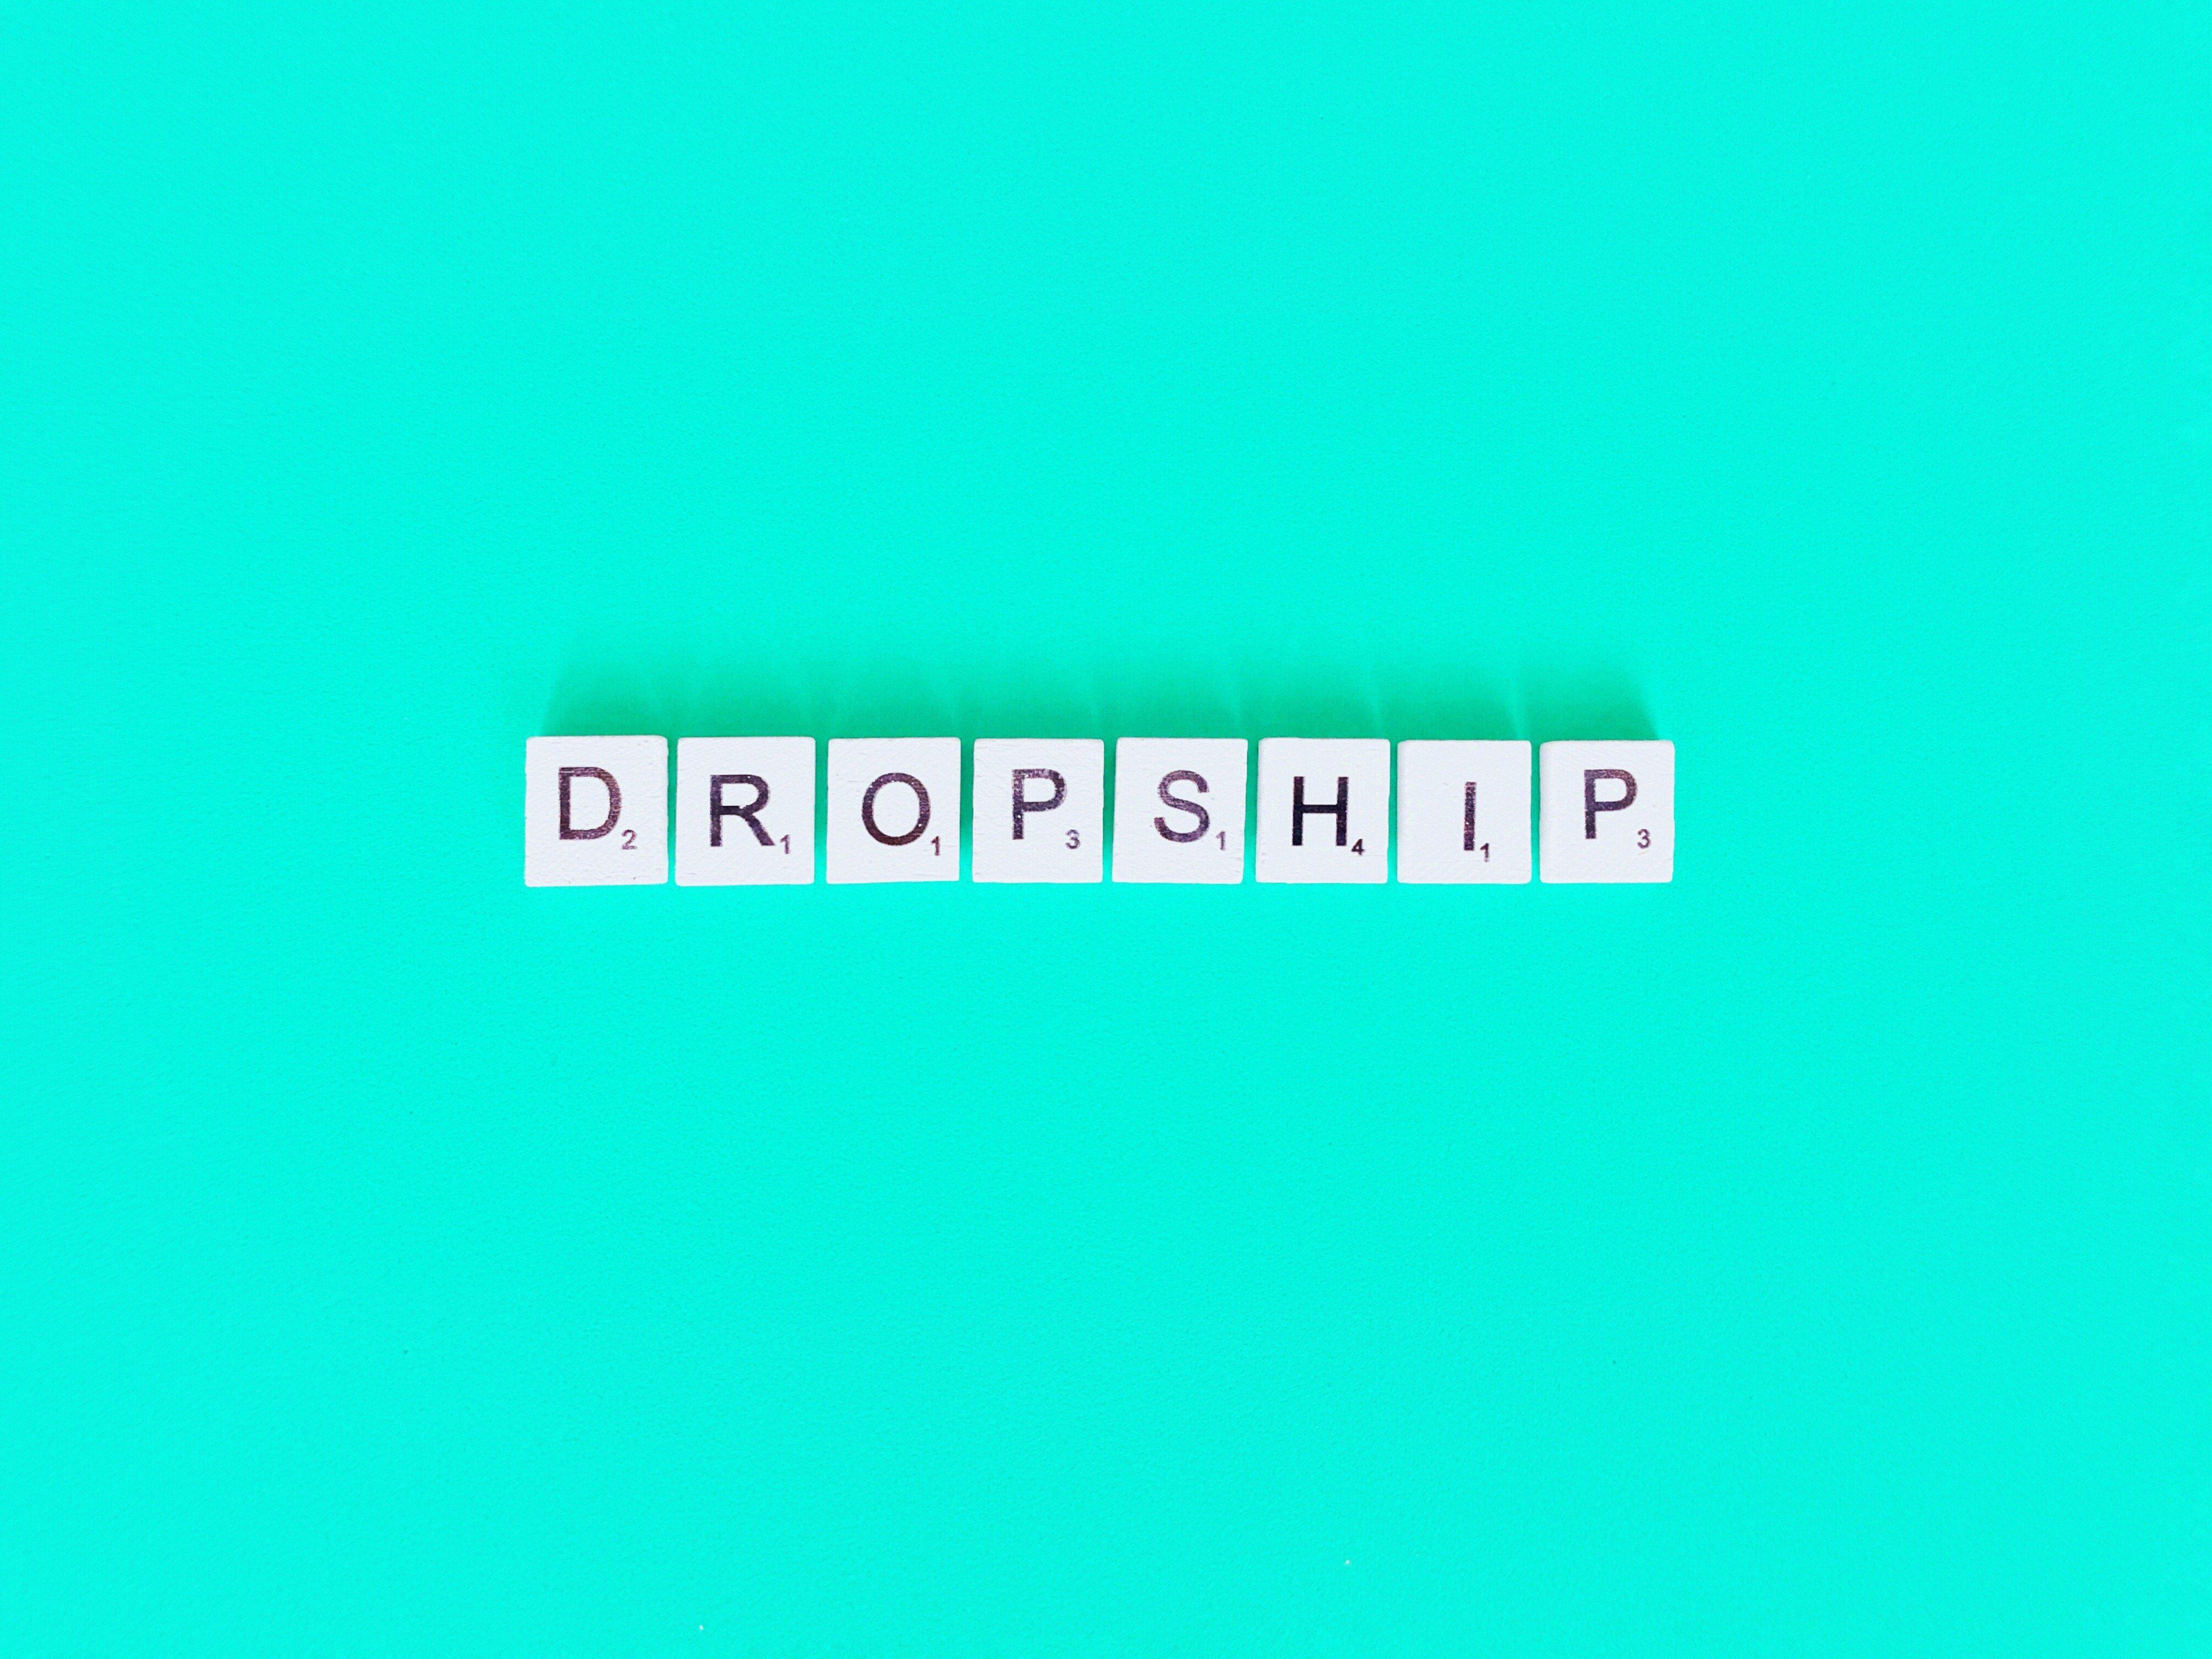 sharprint dropshipping